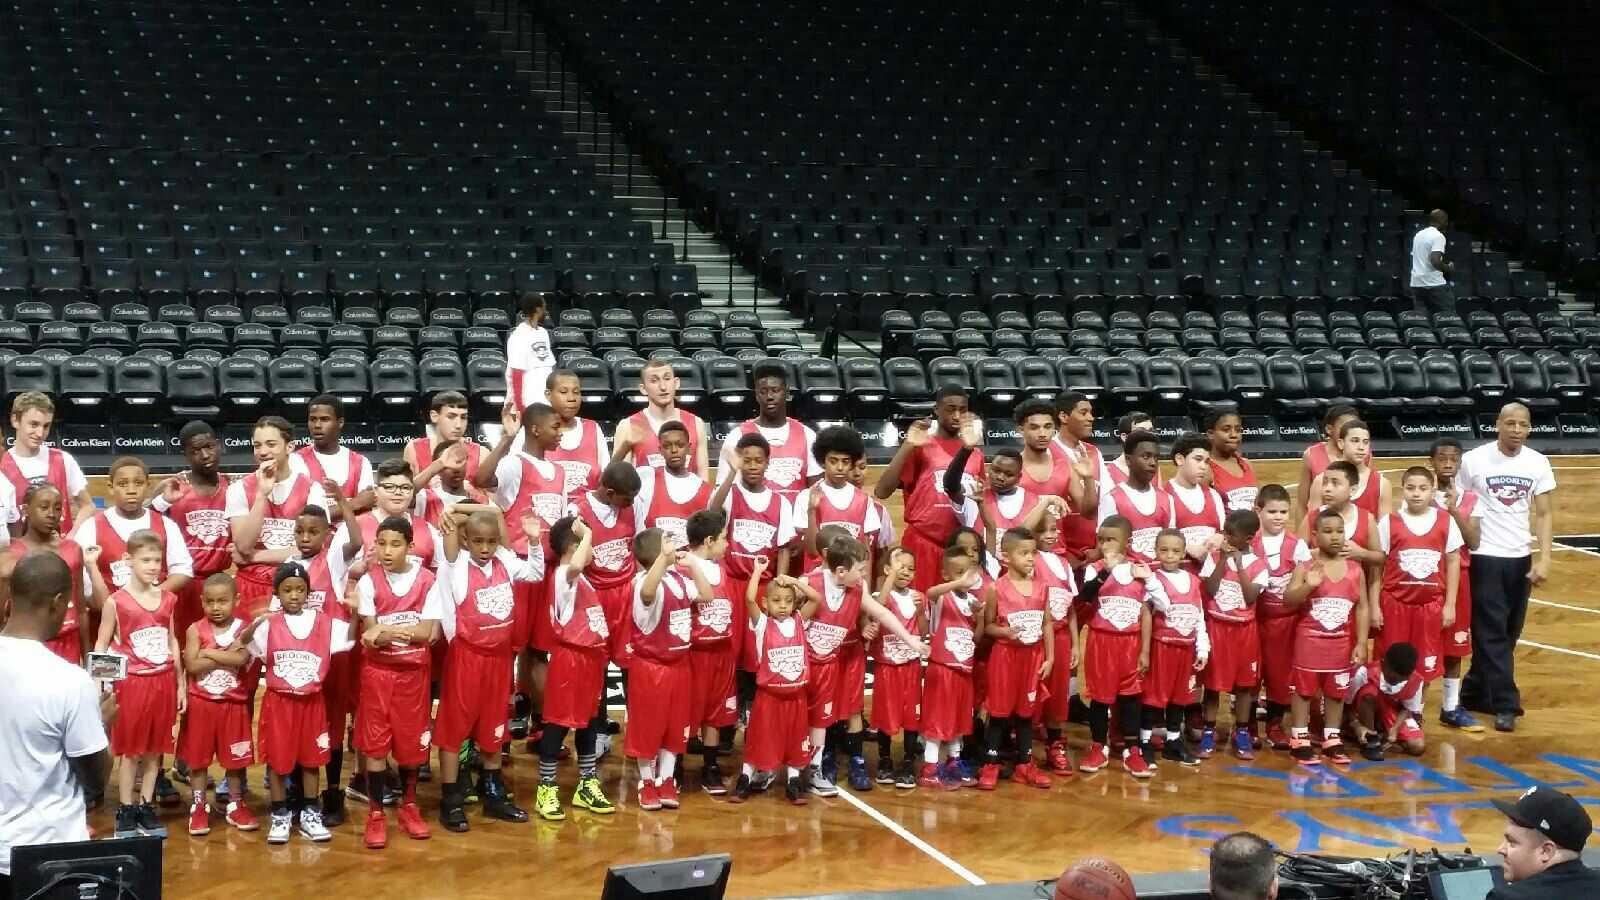 Brooklyn USA Summer Basketball League